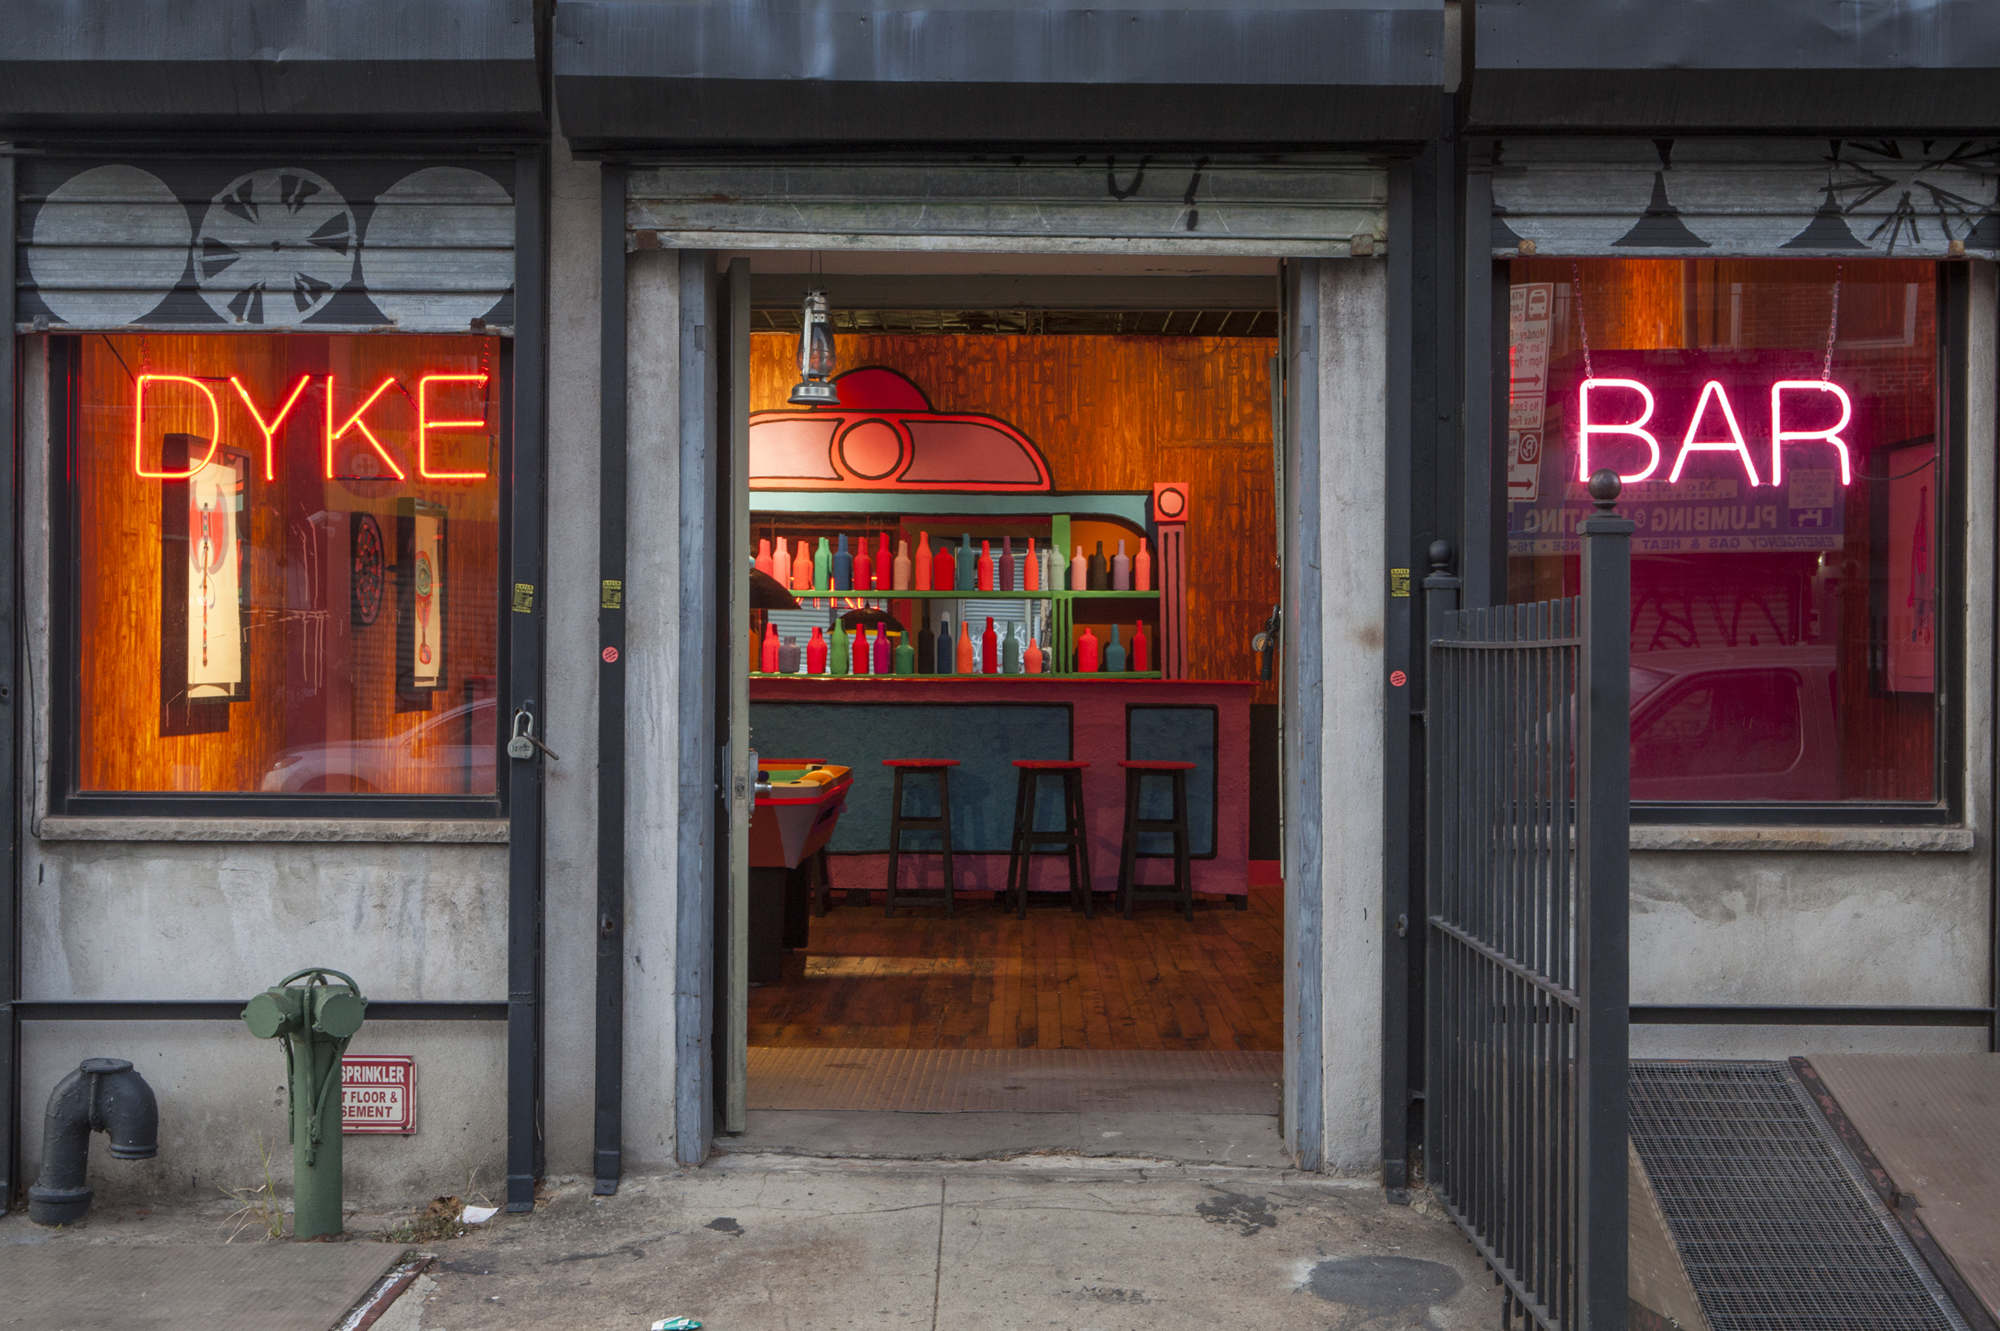 Dyke Bar Exterior